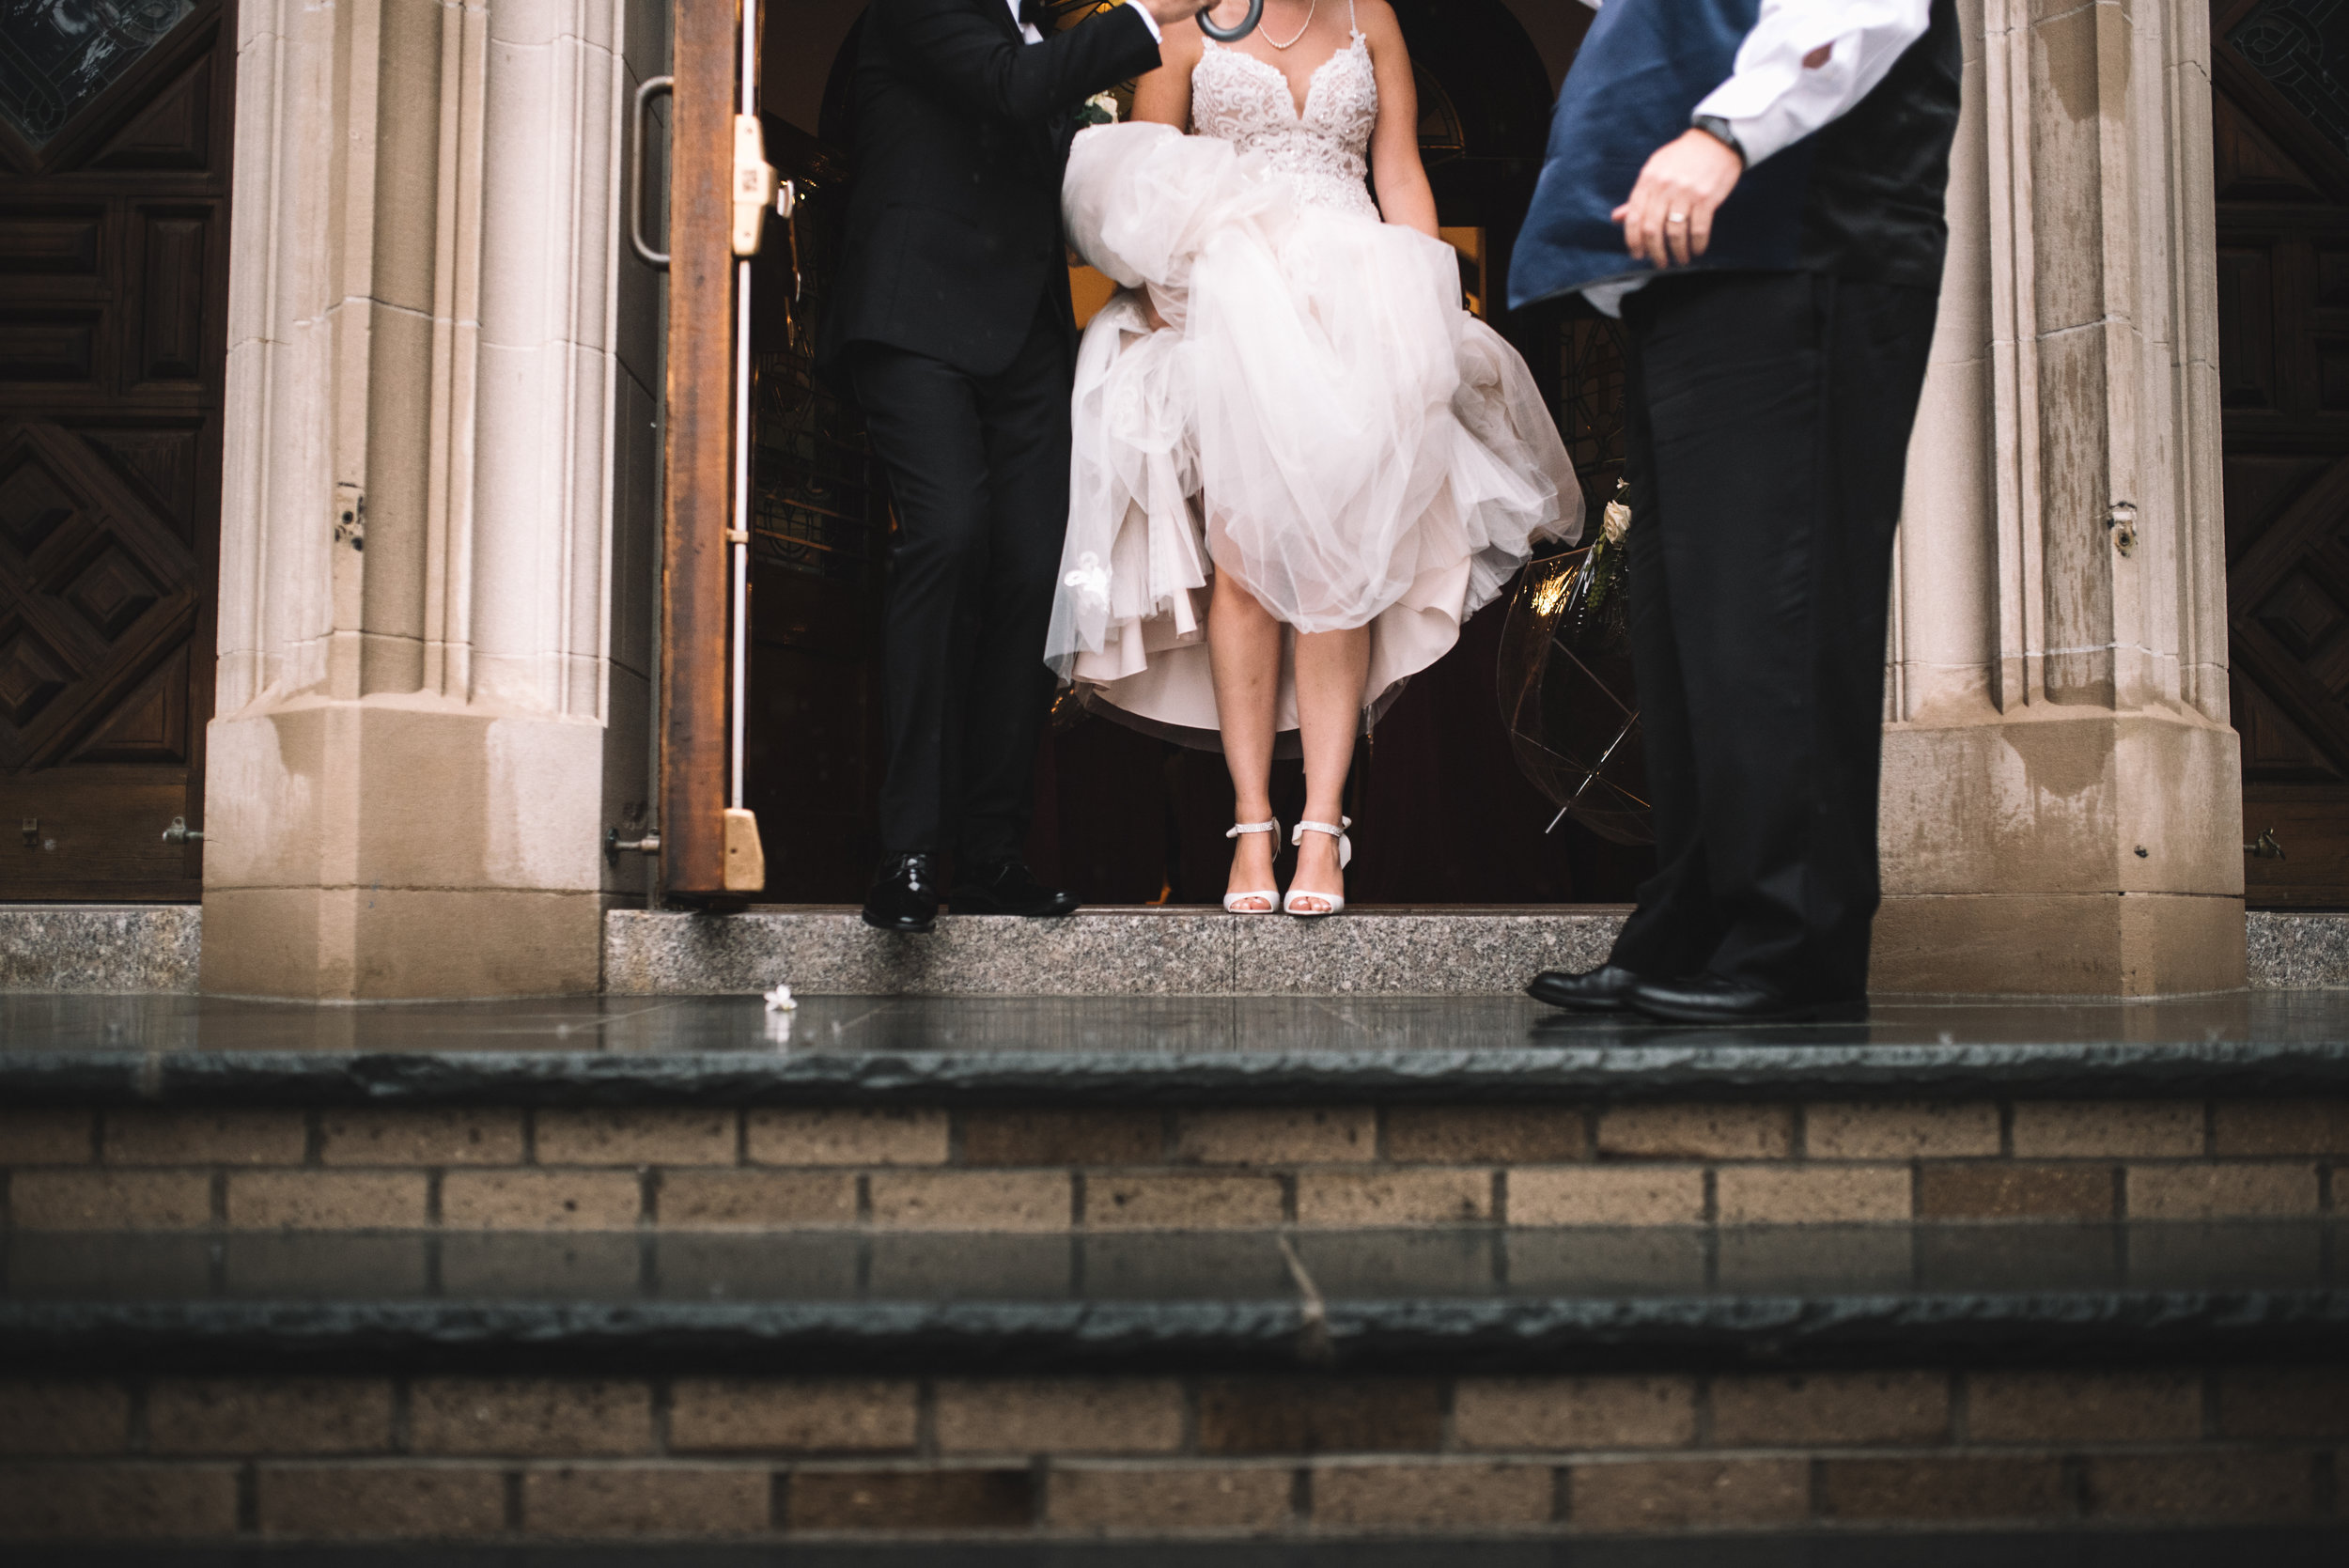 WeddingPhotos | NJPhotographer | Highlights-6-12.jpg